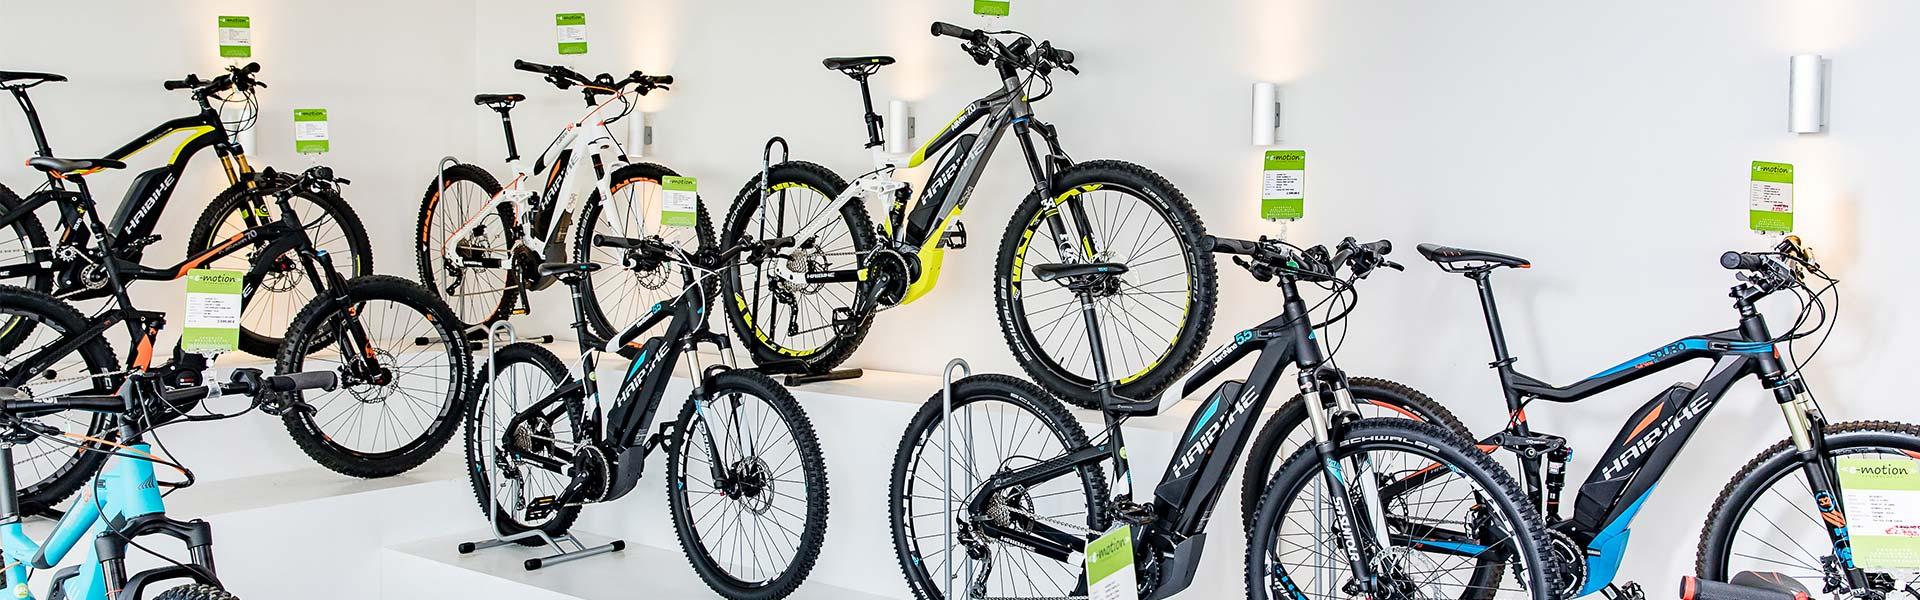 Die e-motion e-Bike Welt Berlin-Mitte